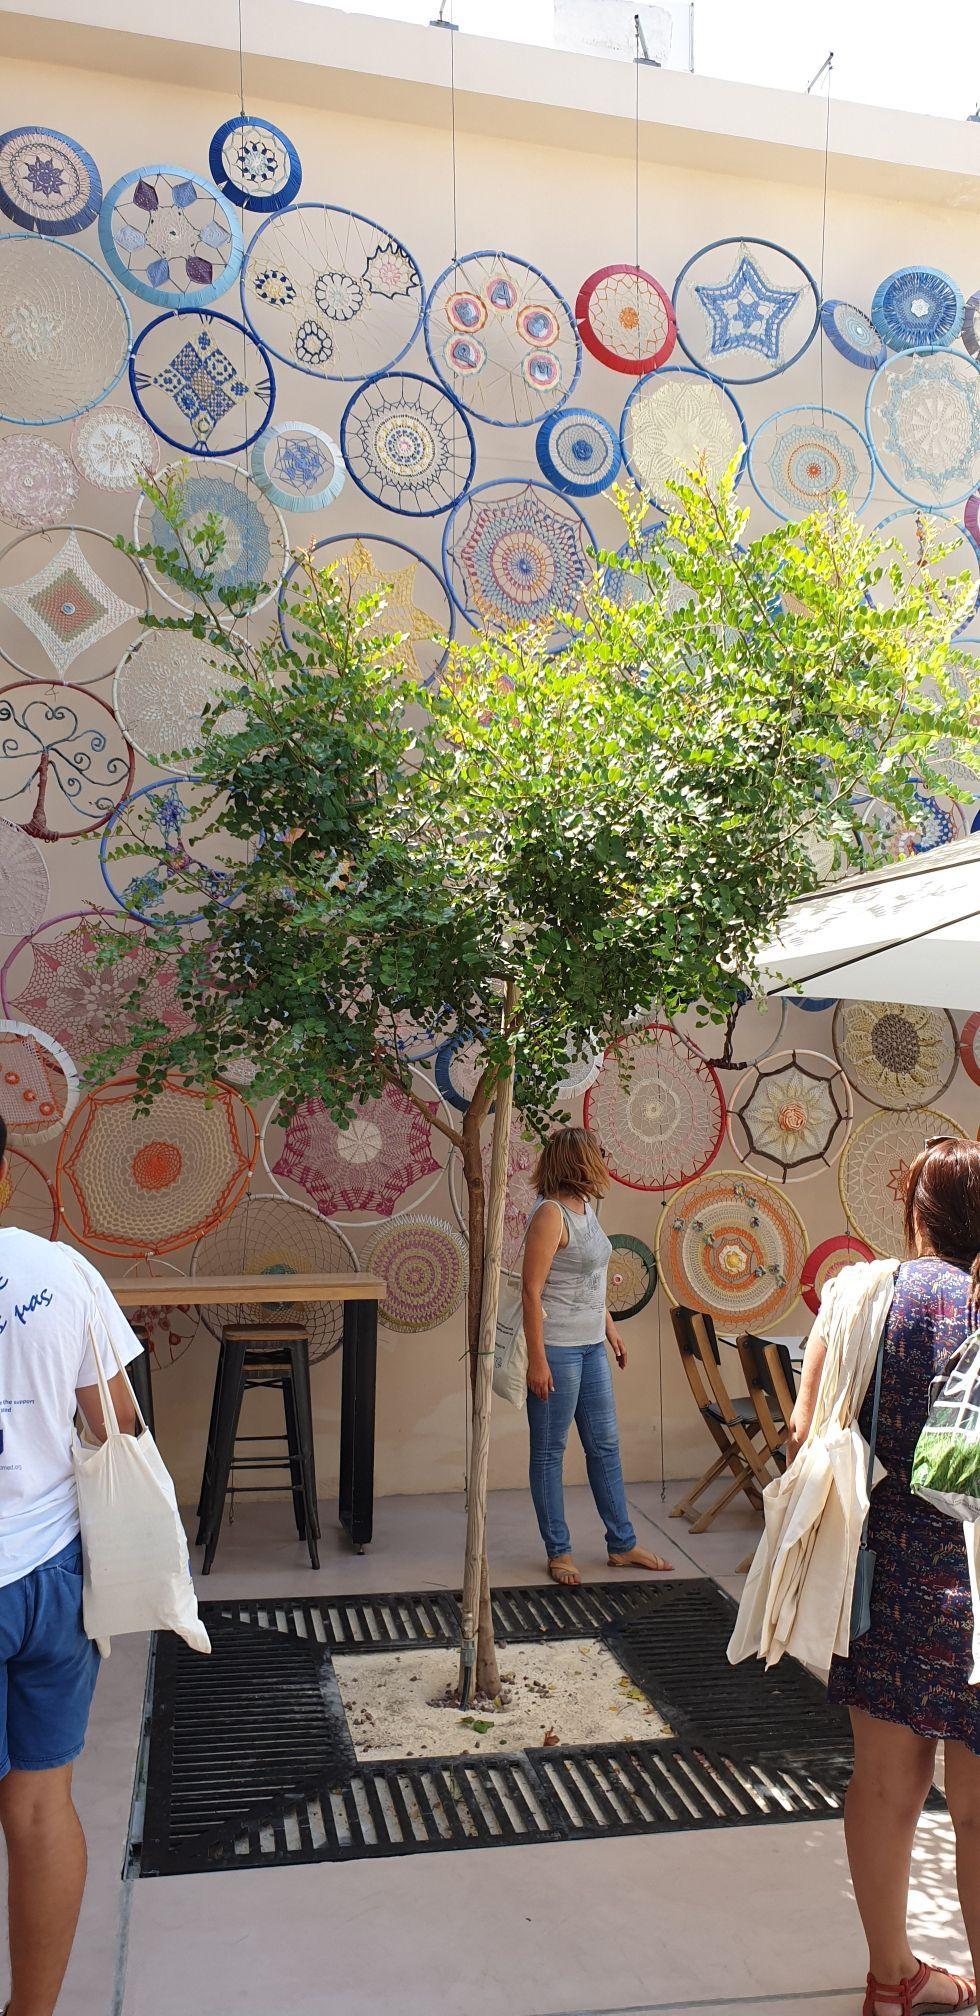 Supporting Employability Through Social Entrepreneurship in Cyprus